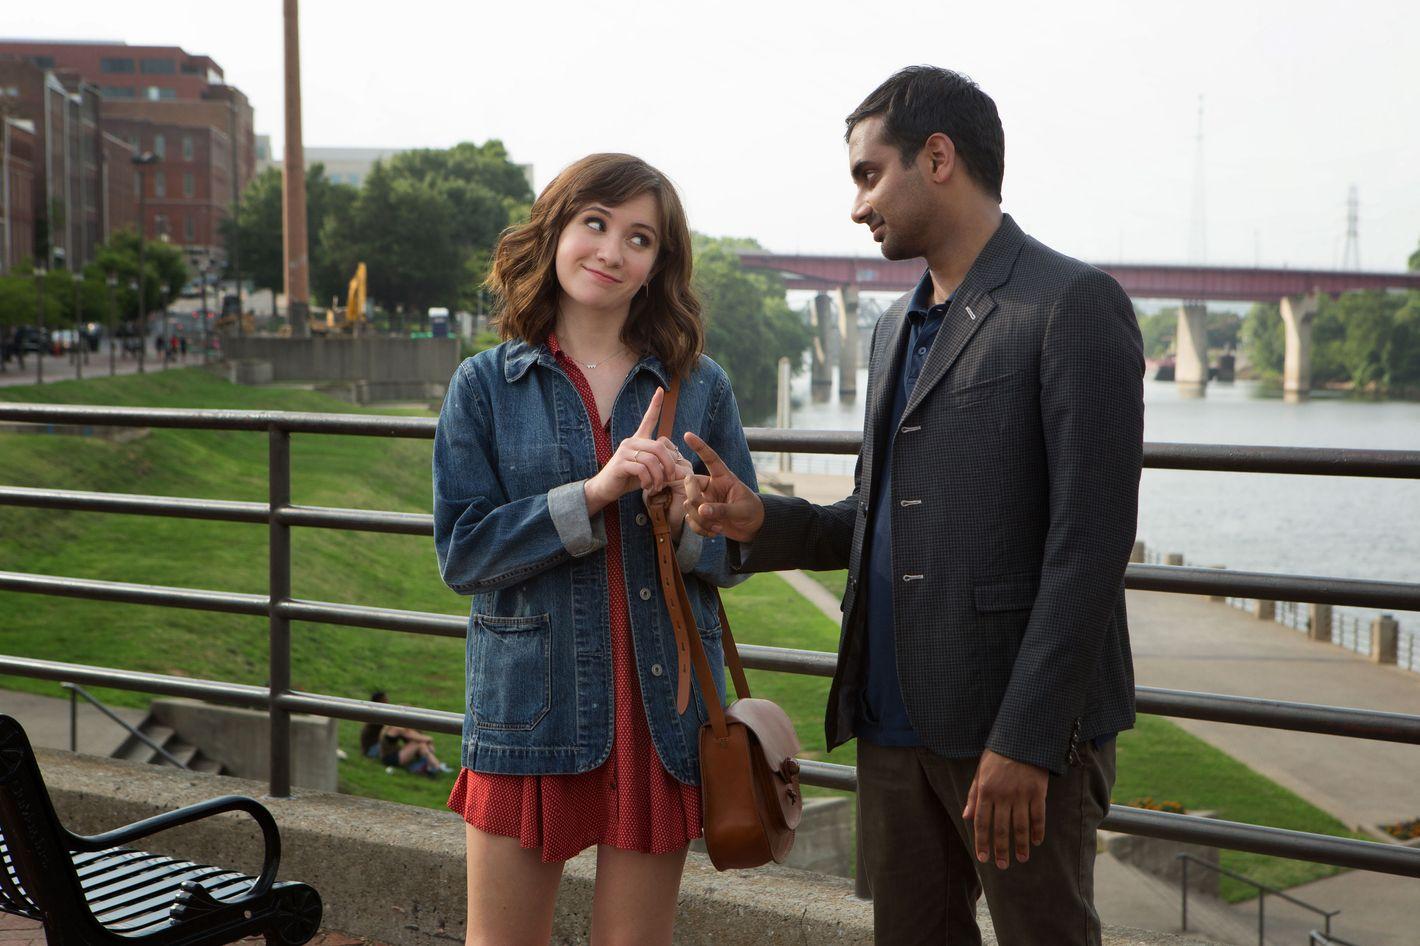 interracial dating new york tips til online dating profiler